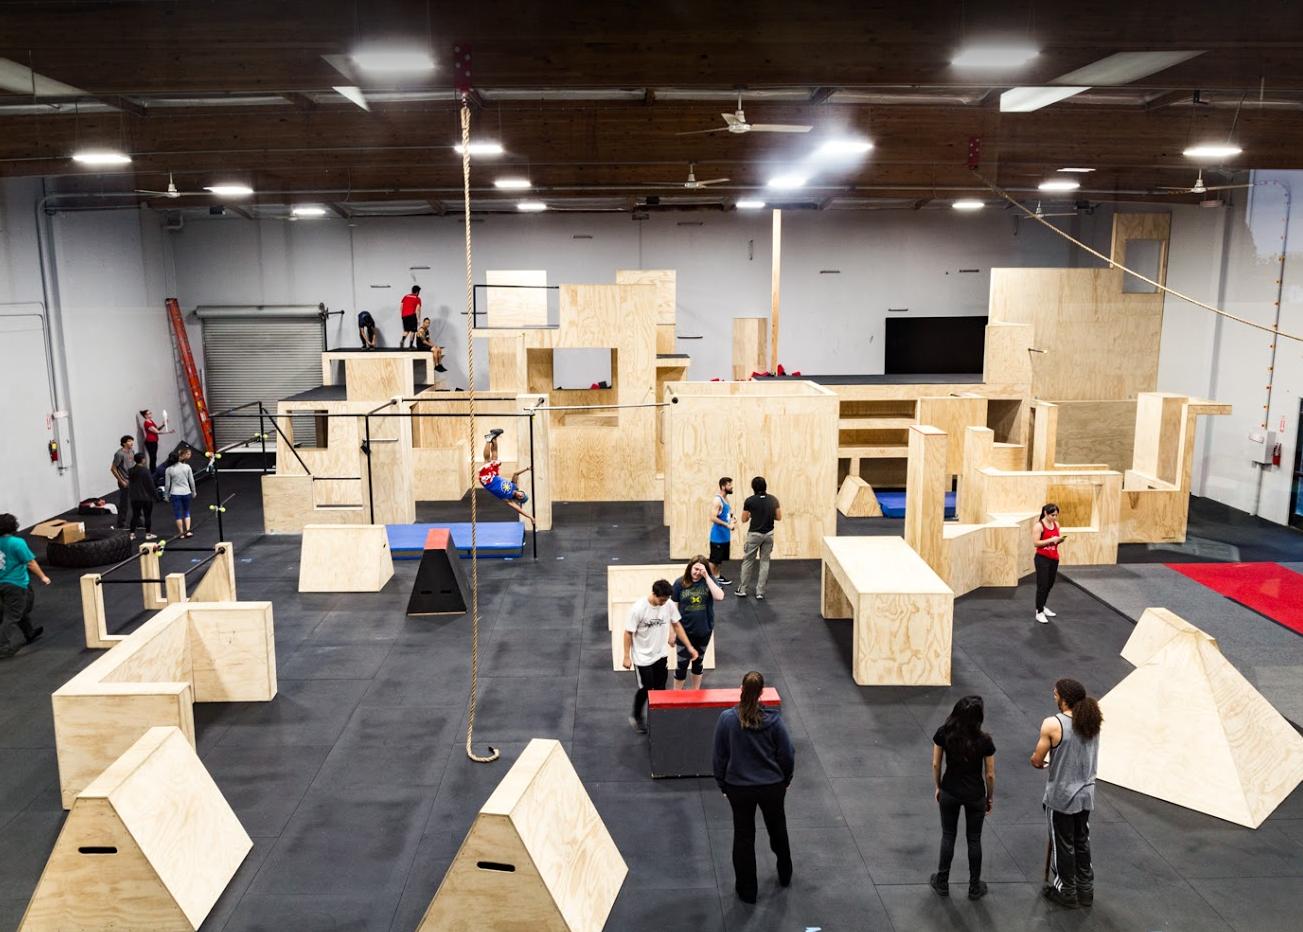 APEX School of Movement San Diego image 1